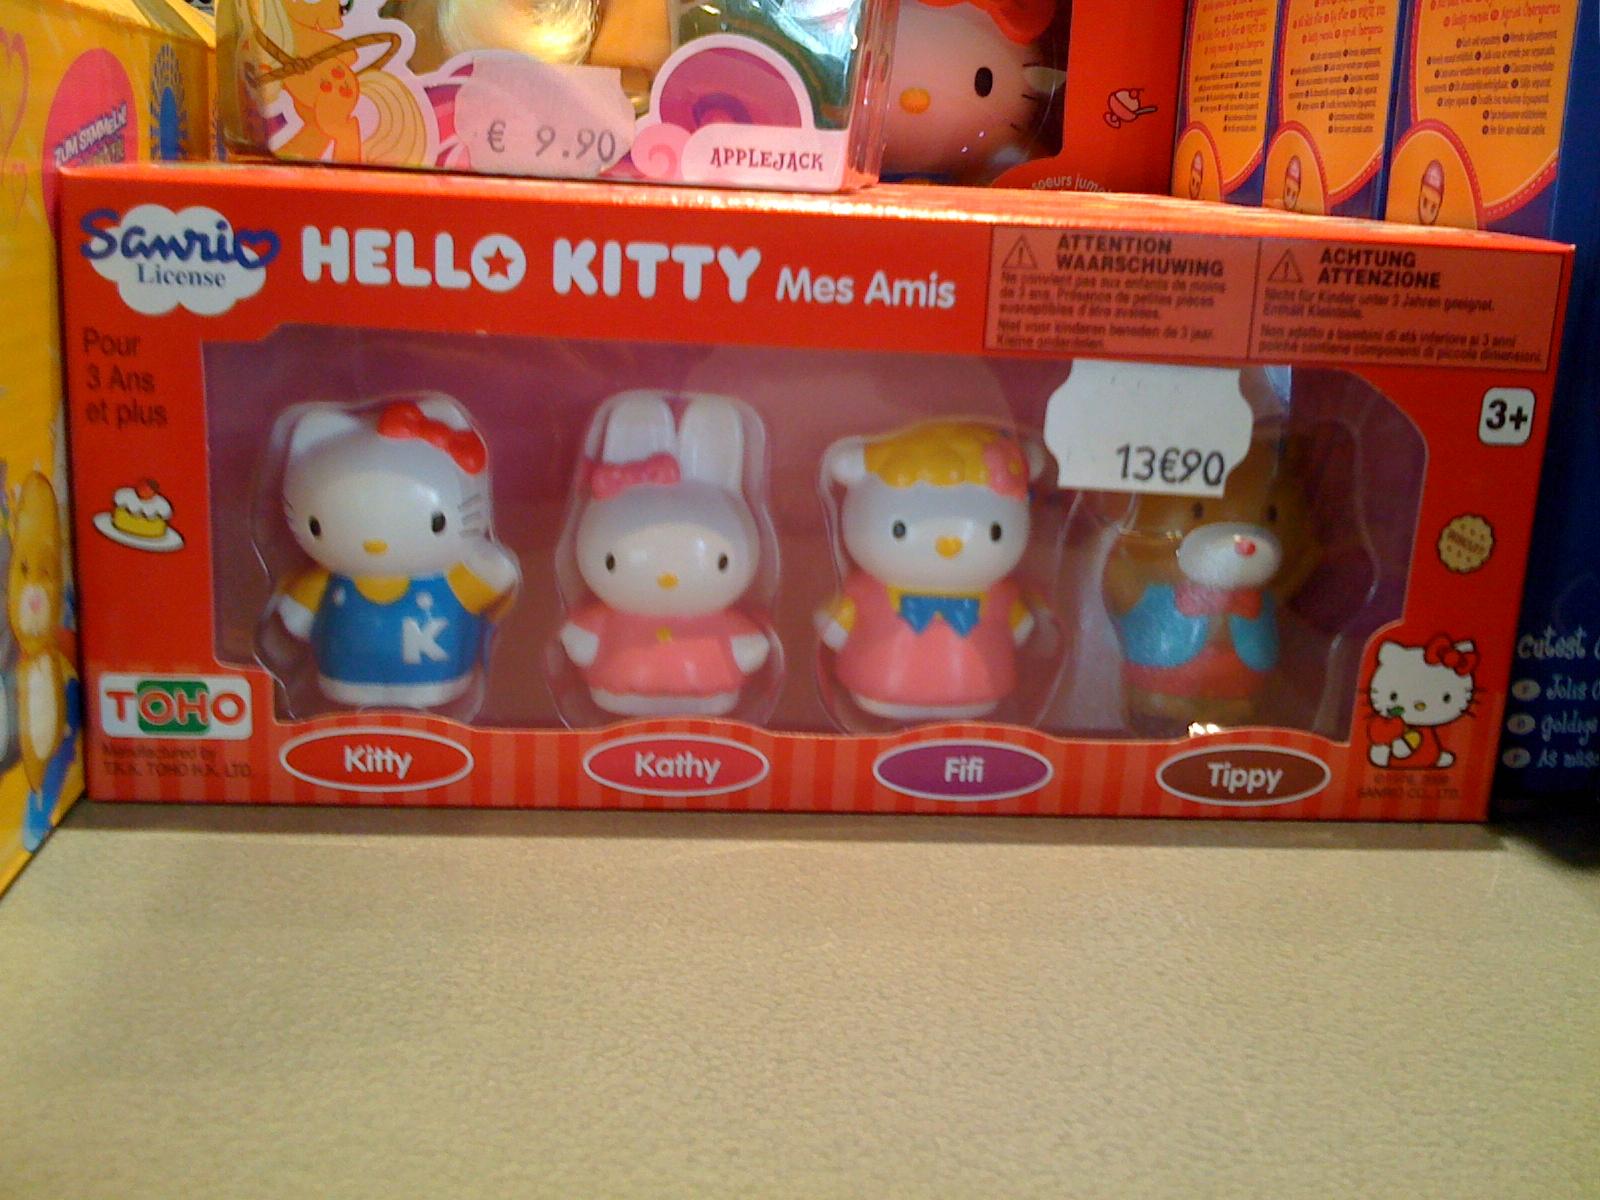 Hello Kitty Mes Amis